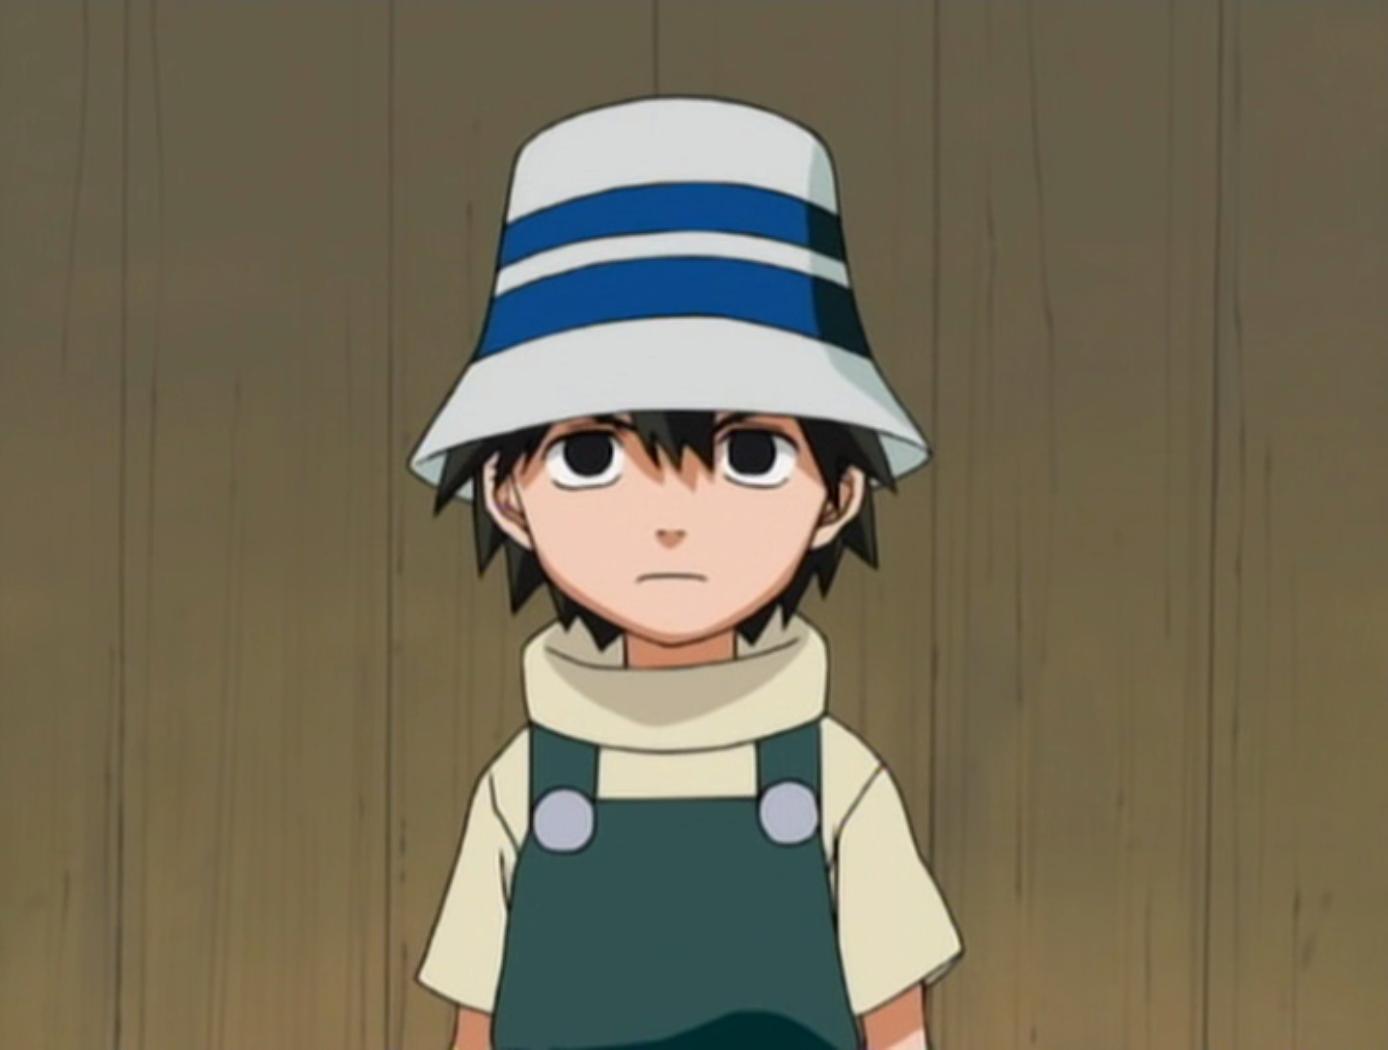 Diviso Paralela Analisando Animes Naruto Clssico